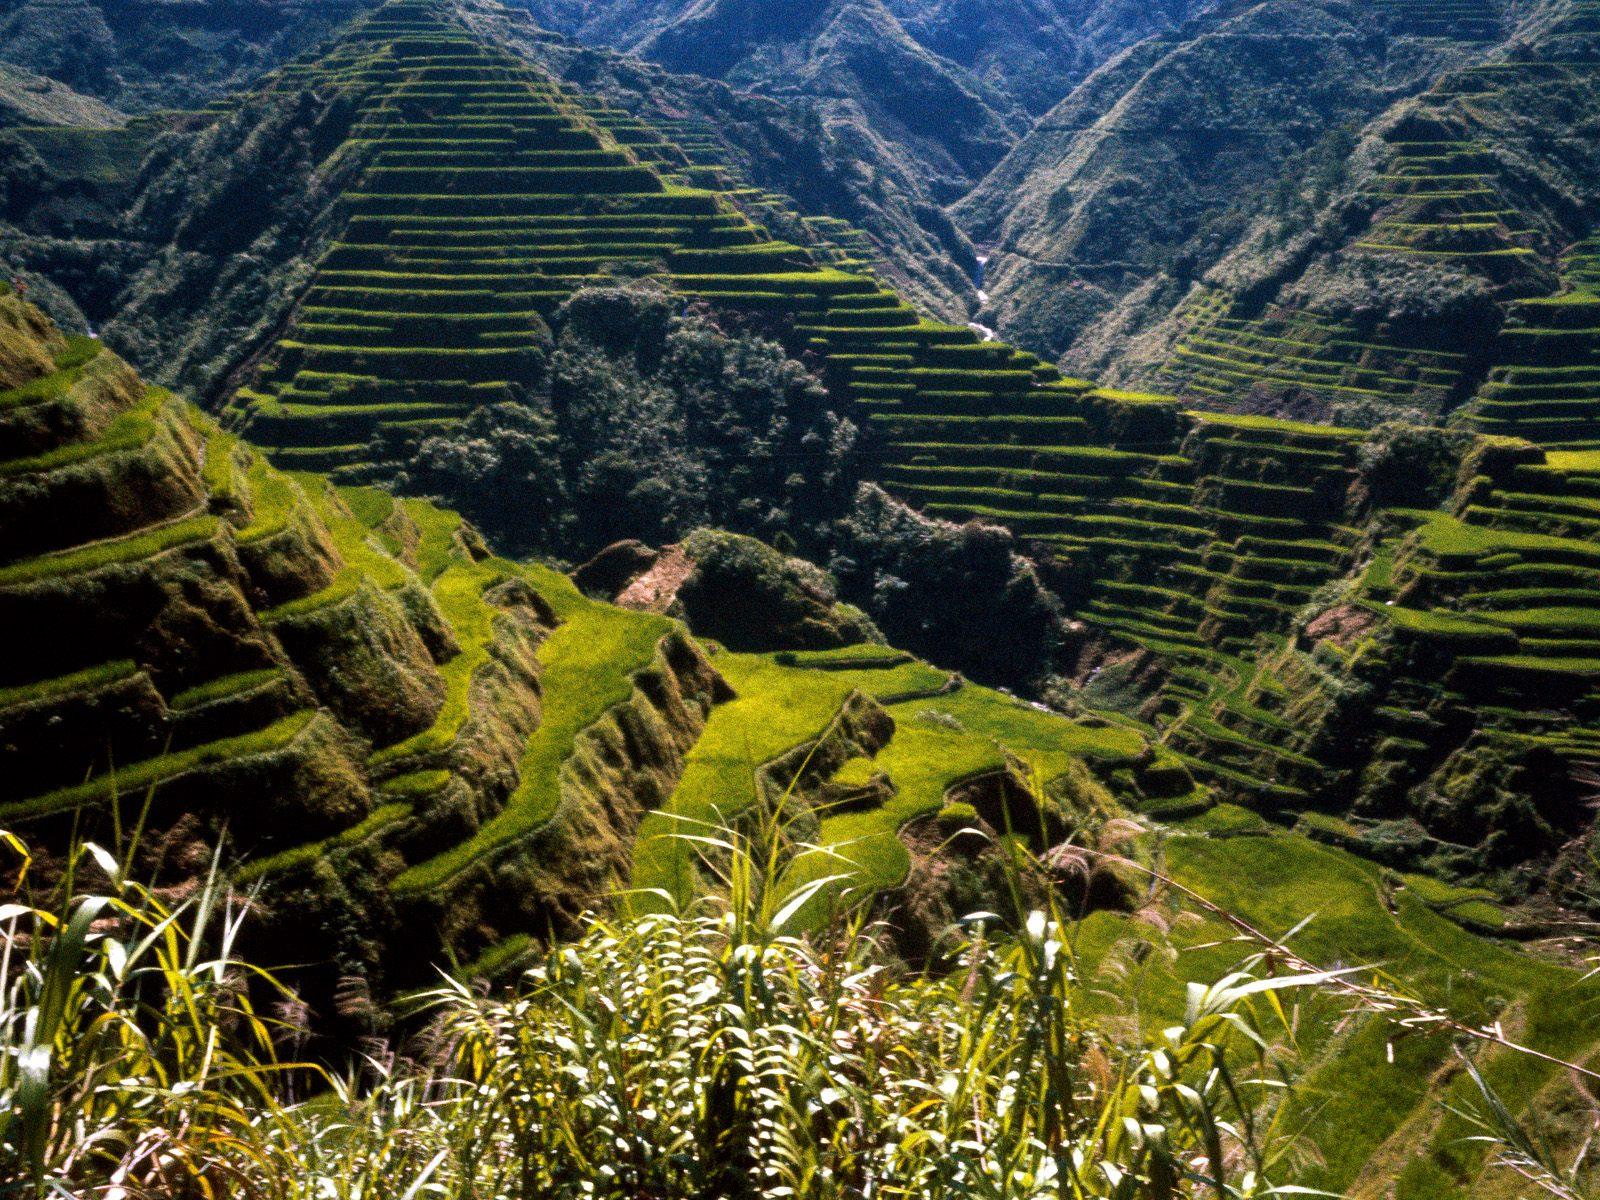 http://1.bp.blogspot.com/-sdFo8Jb47wU/TwLP002ZxwI/AAAAAAAAAr8/VCHbiZUKzzY/s1600/philippines-wallpaper-2-739105.jpg